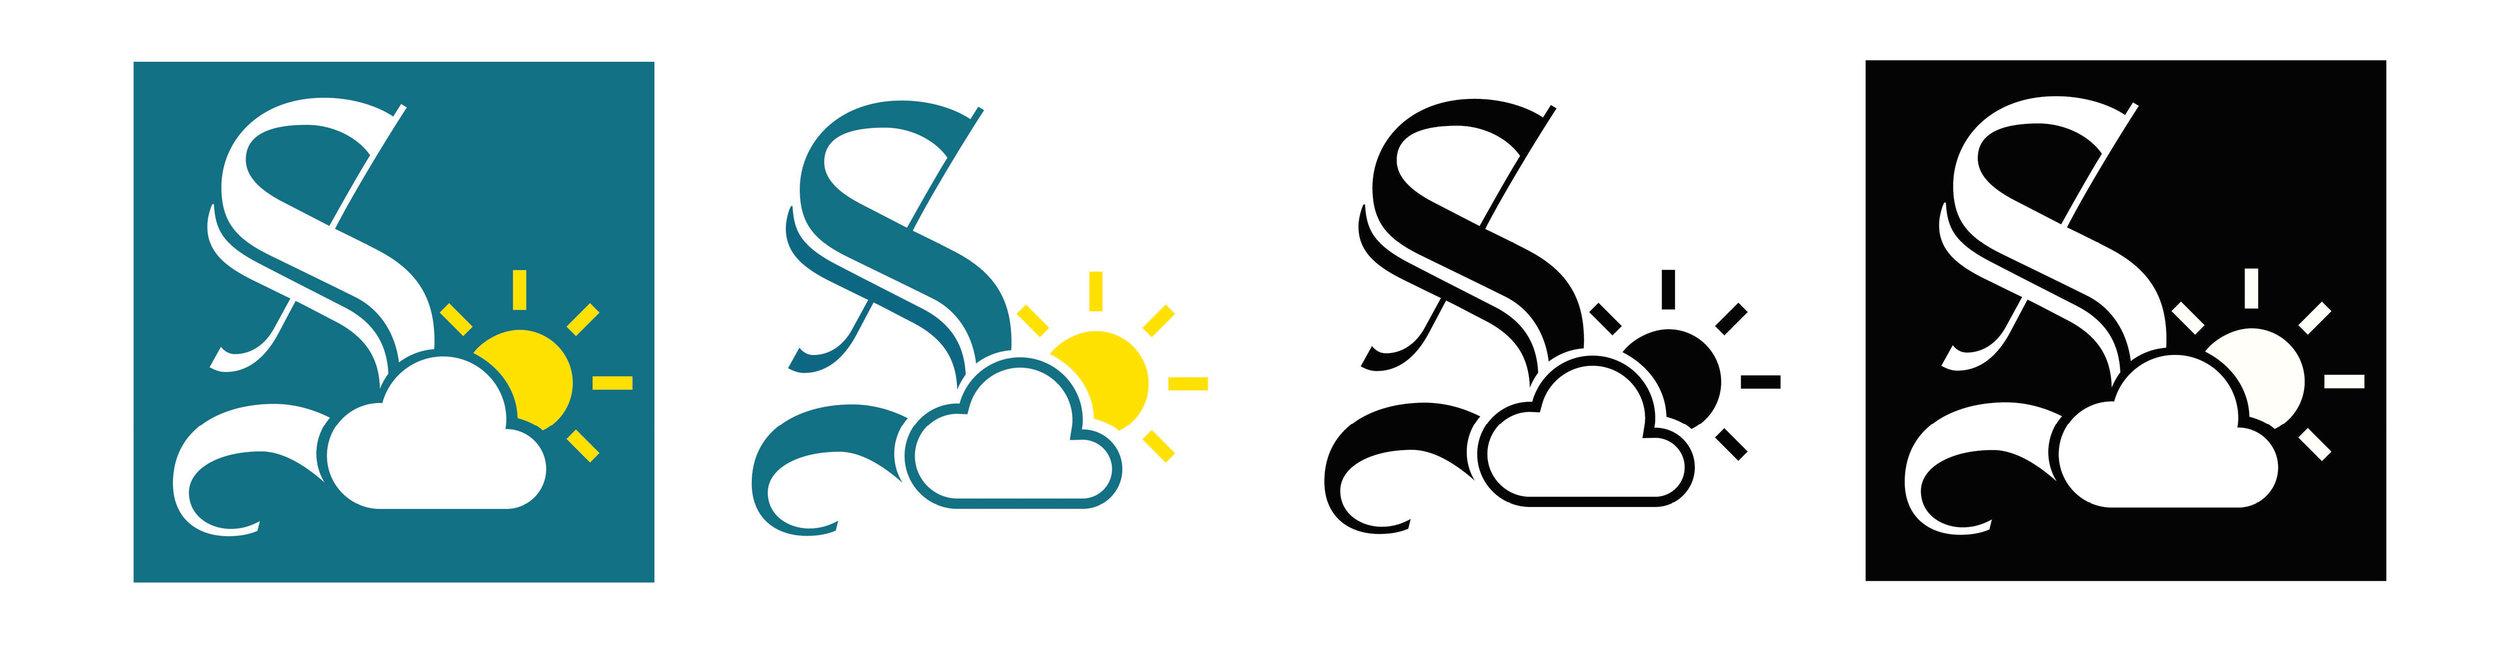 weather_alllogos.JPG